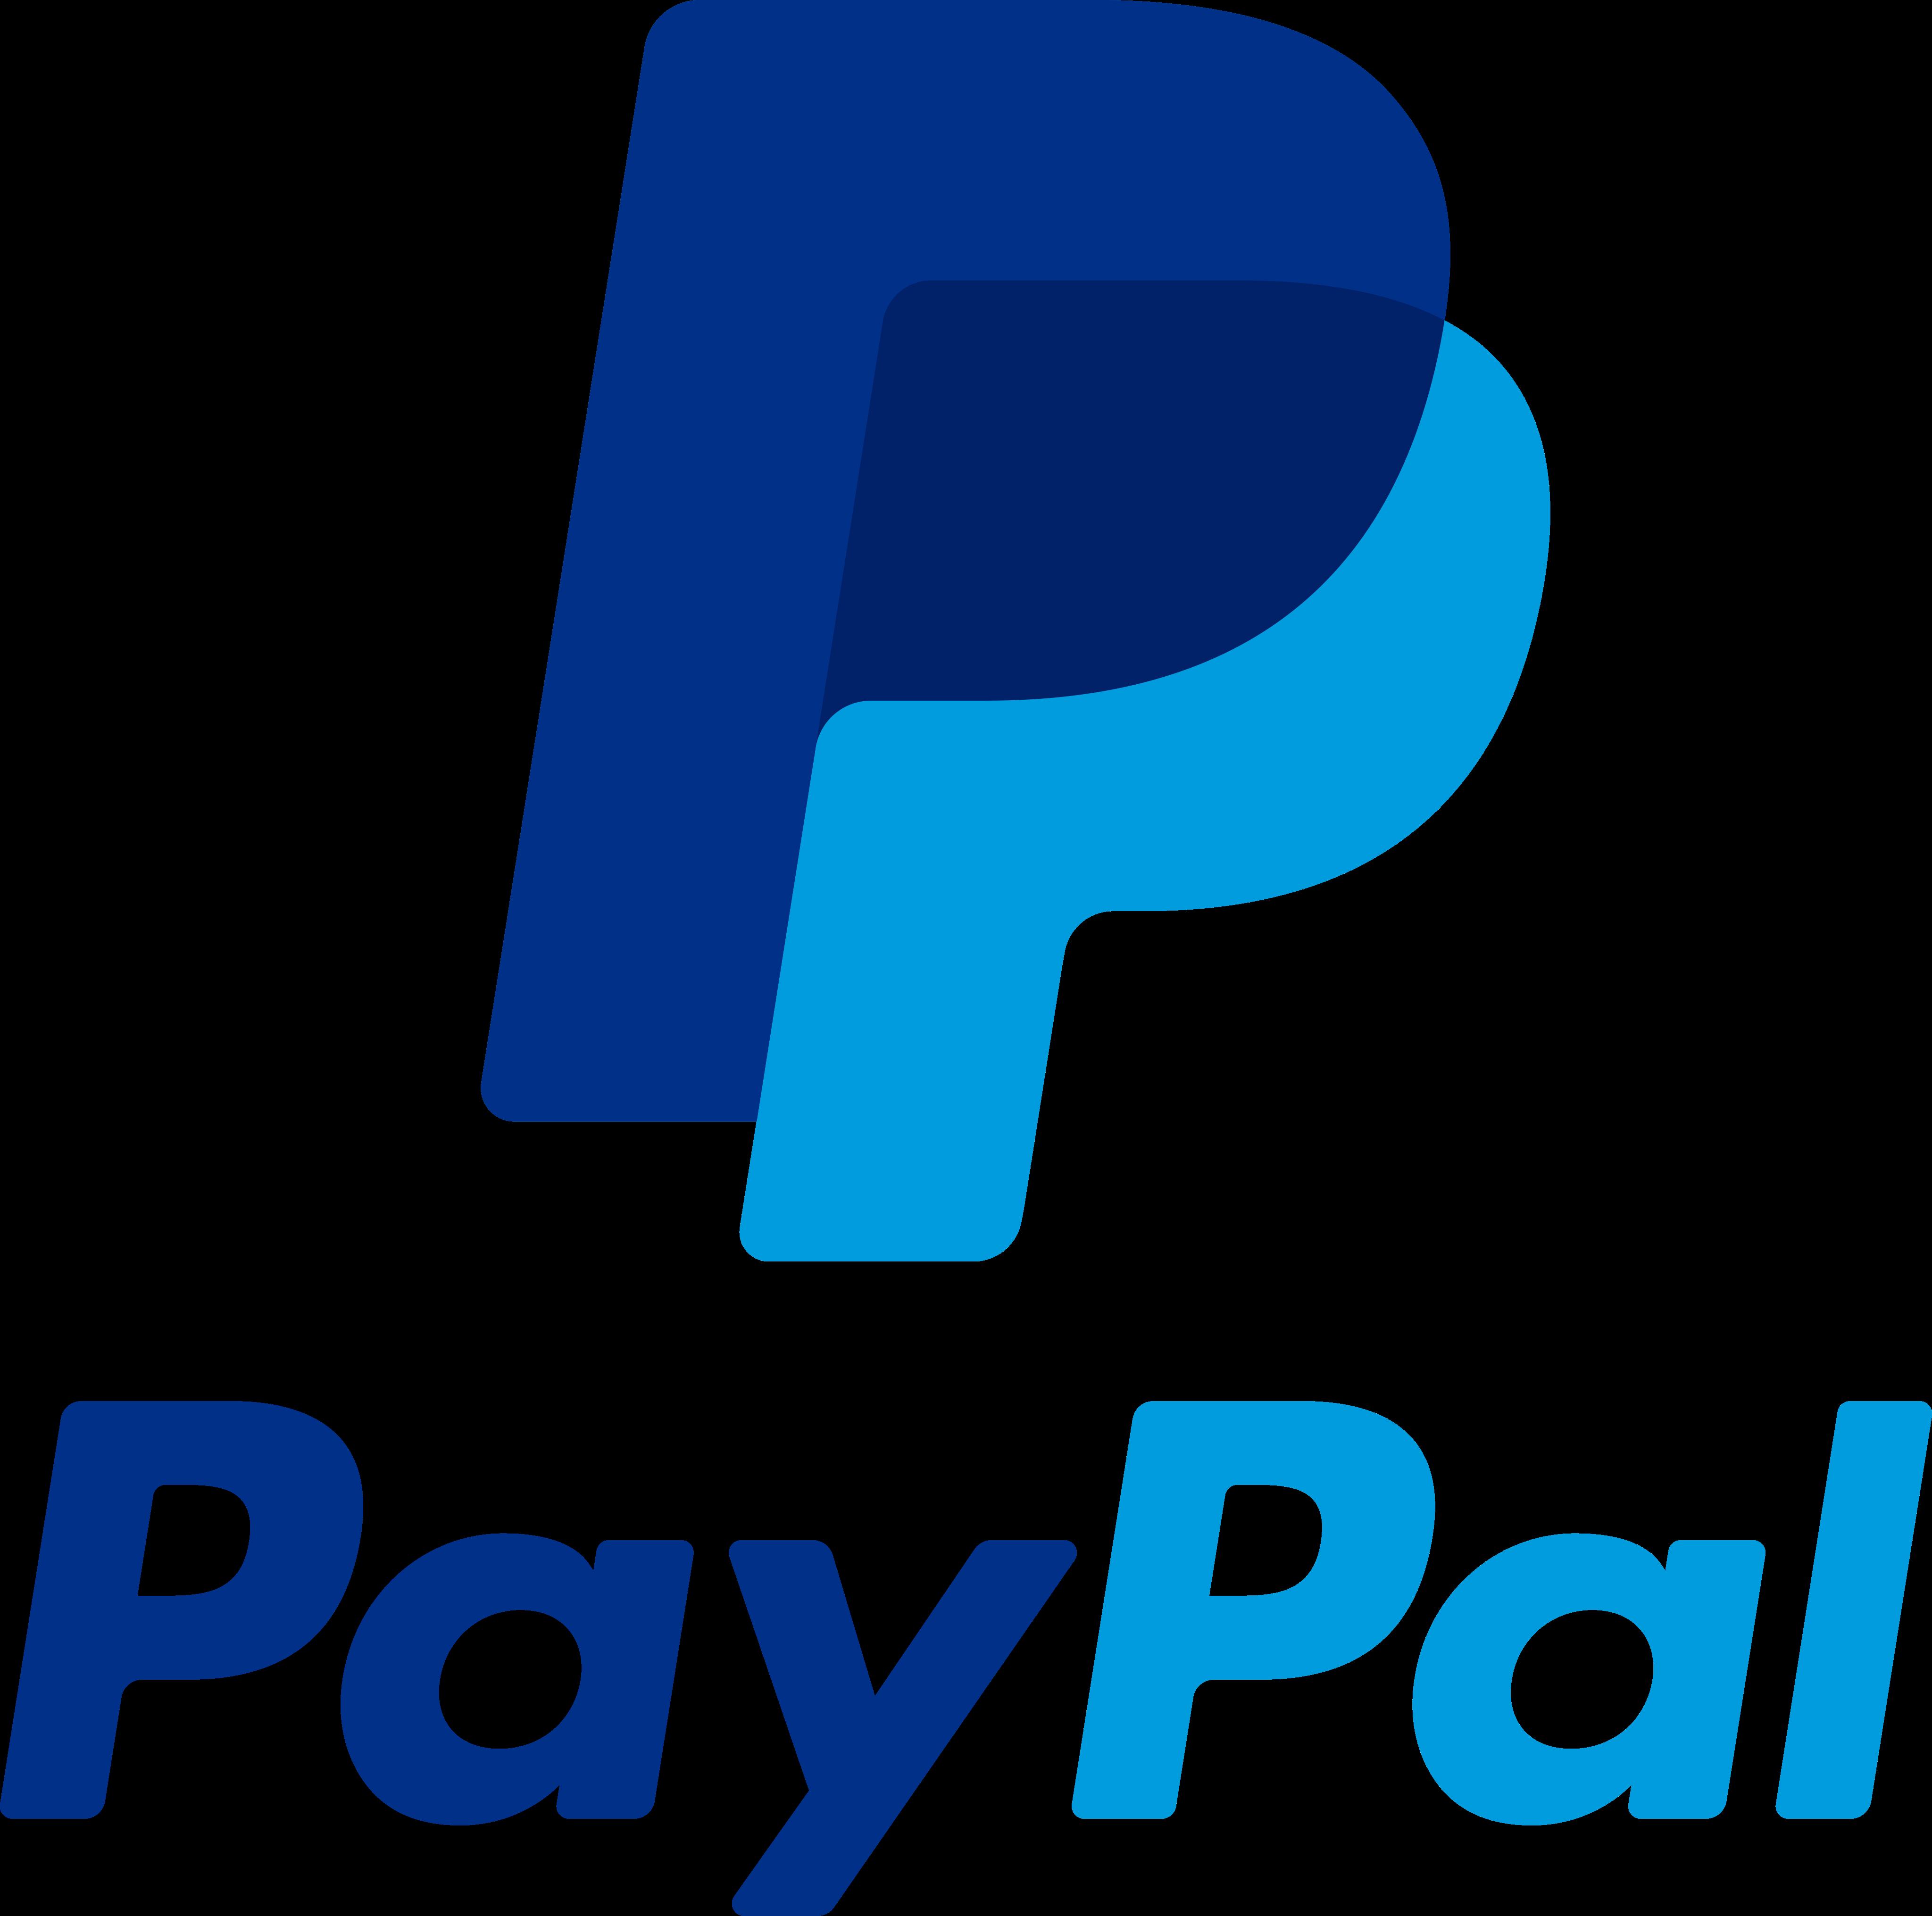 paypal logo 1 1 - Paypal Logo